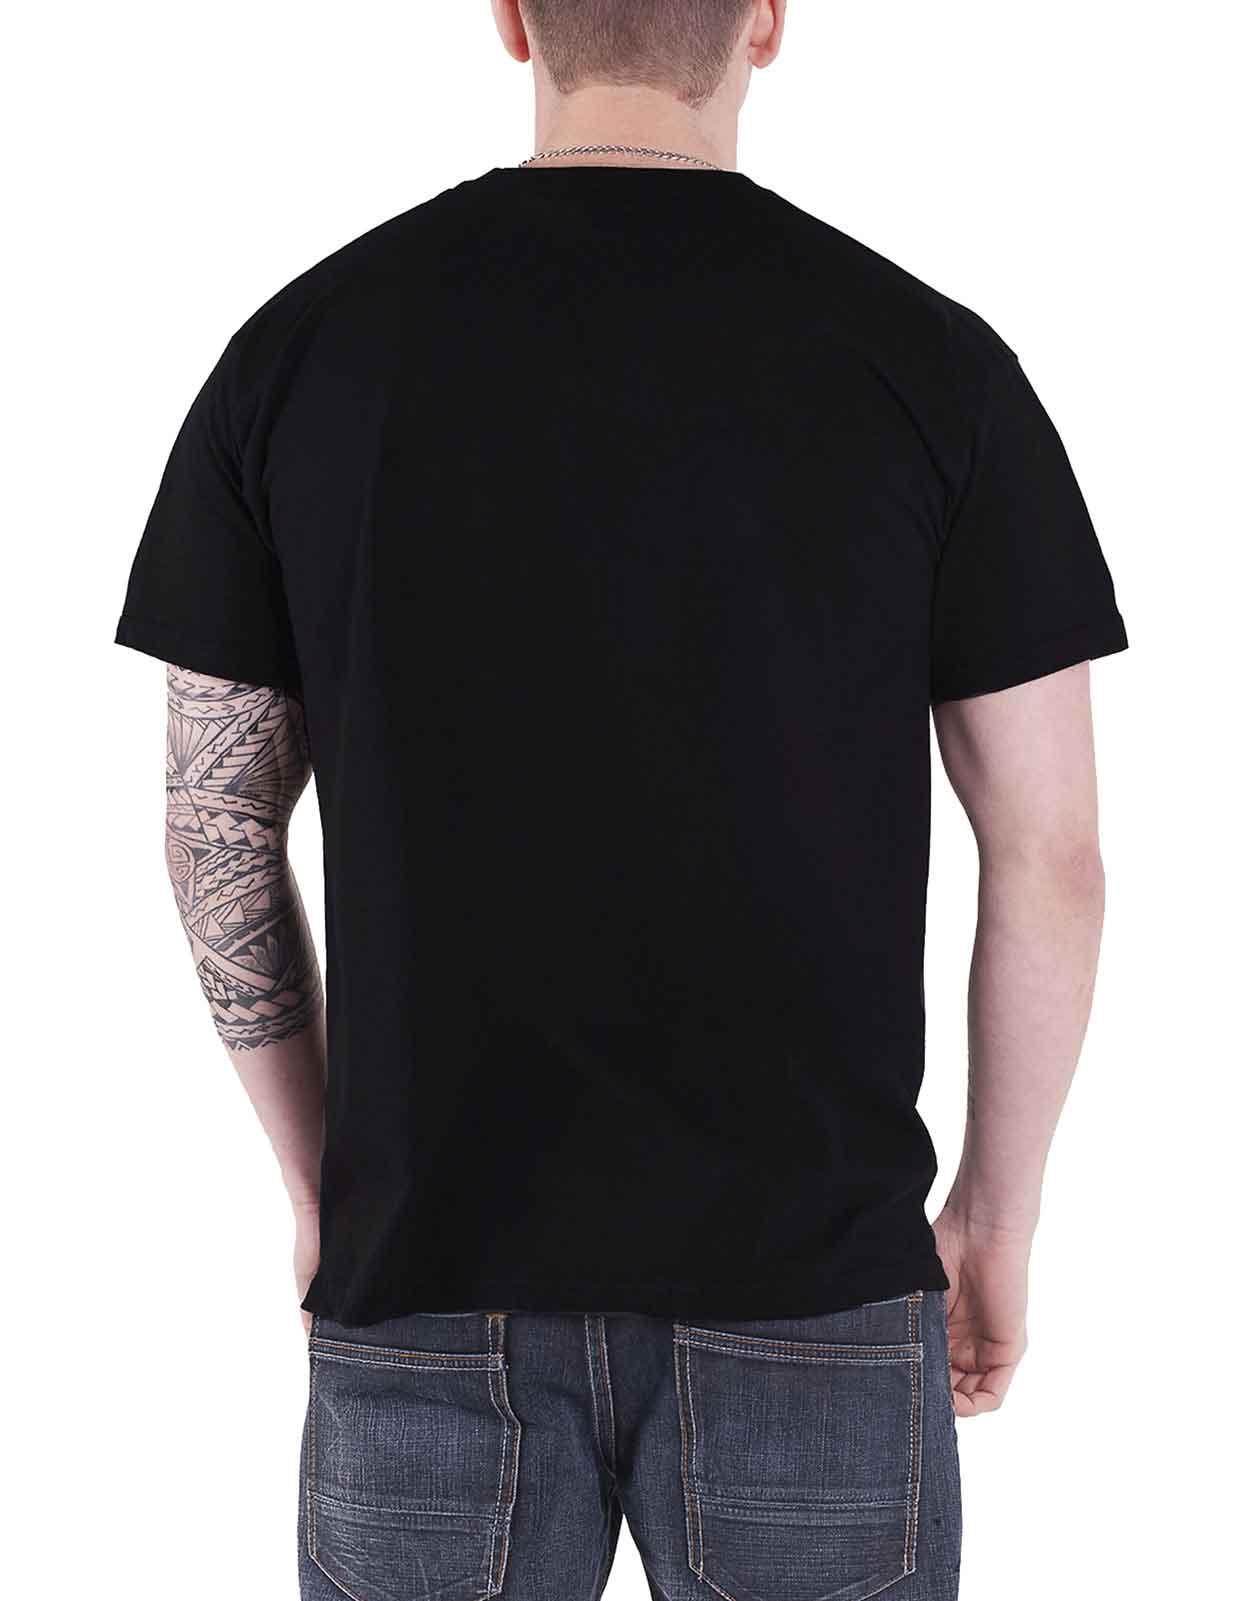 Official-Iron-Maiden-T-shirt-book-of-souls-trooper-killers-tour-band-logo-mens miniatuur 85